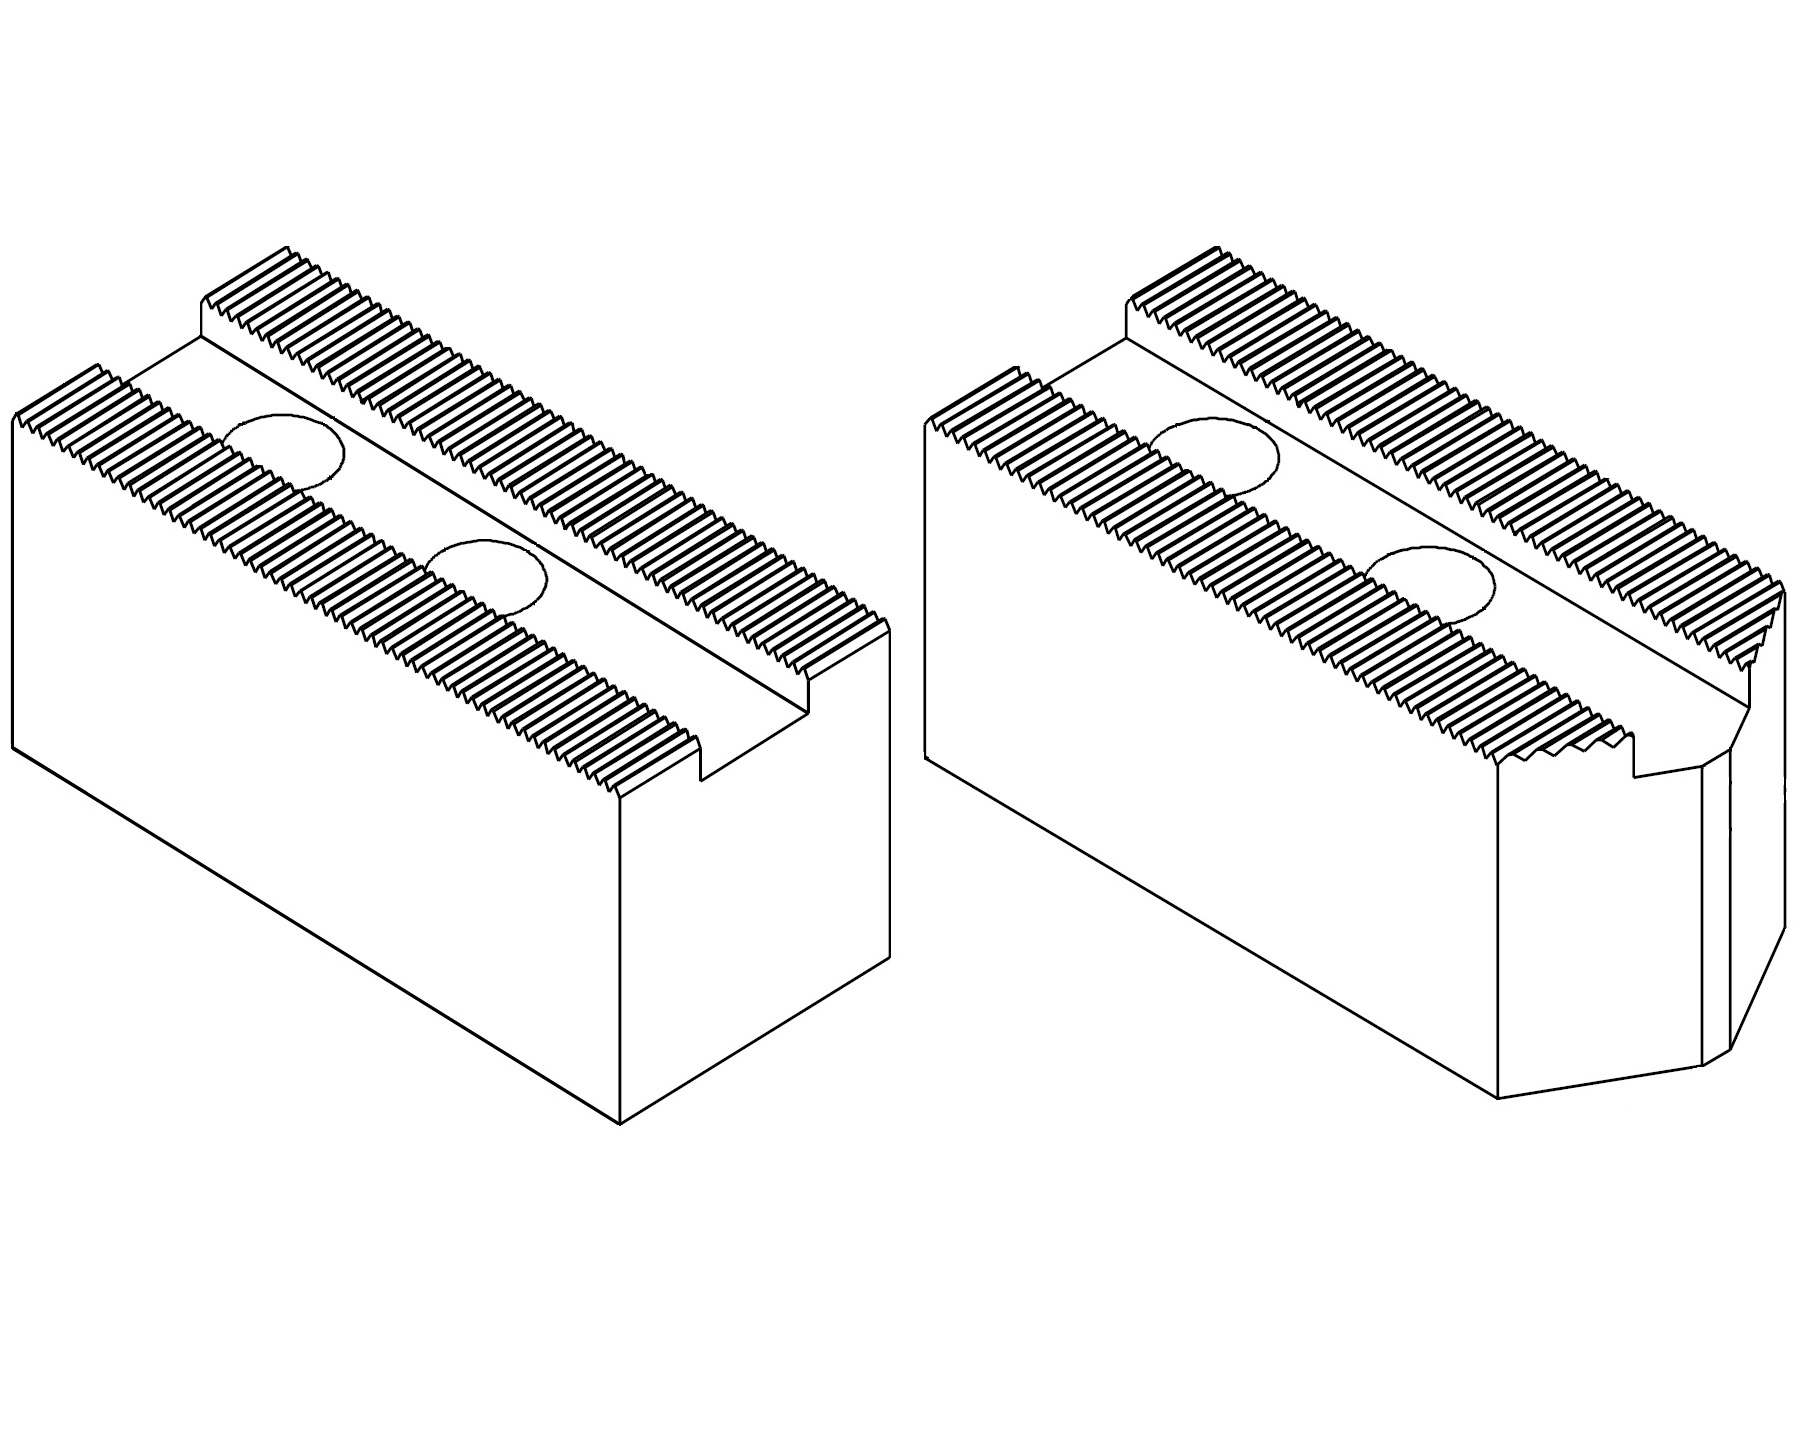 "Čelisti měkké 3/32""x90°, šířka drážky - 30 (sklíčidla pr. 630 - 1200 mm)"